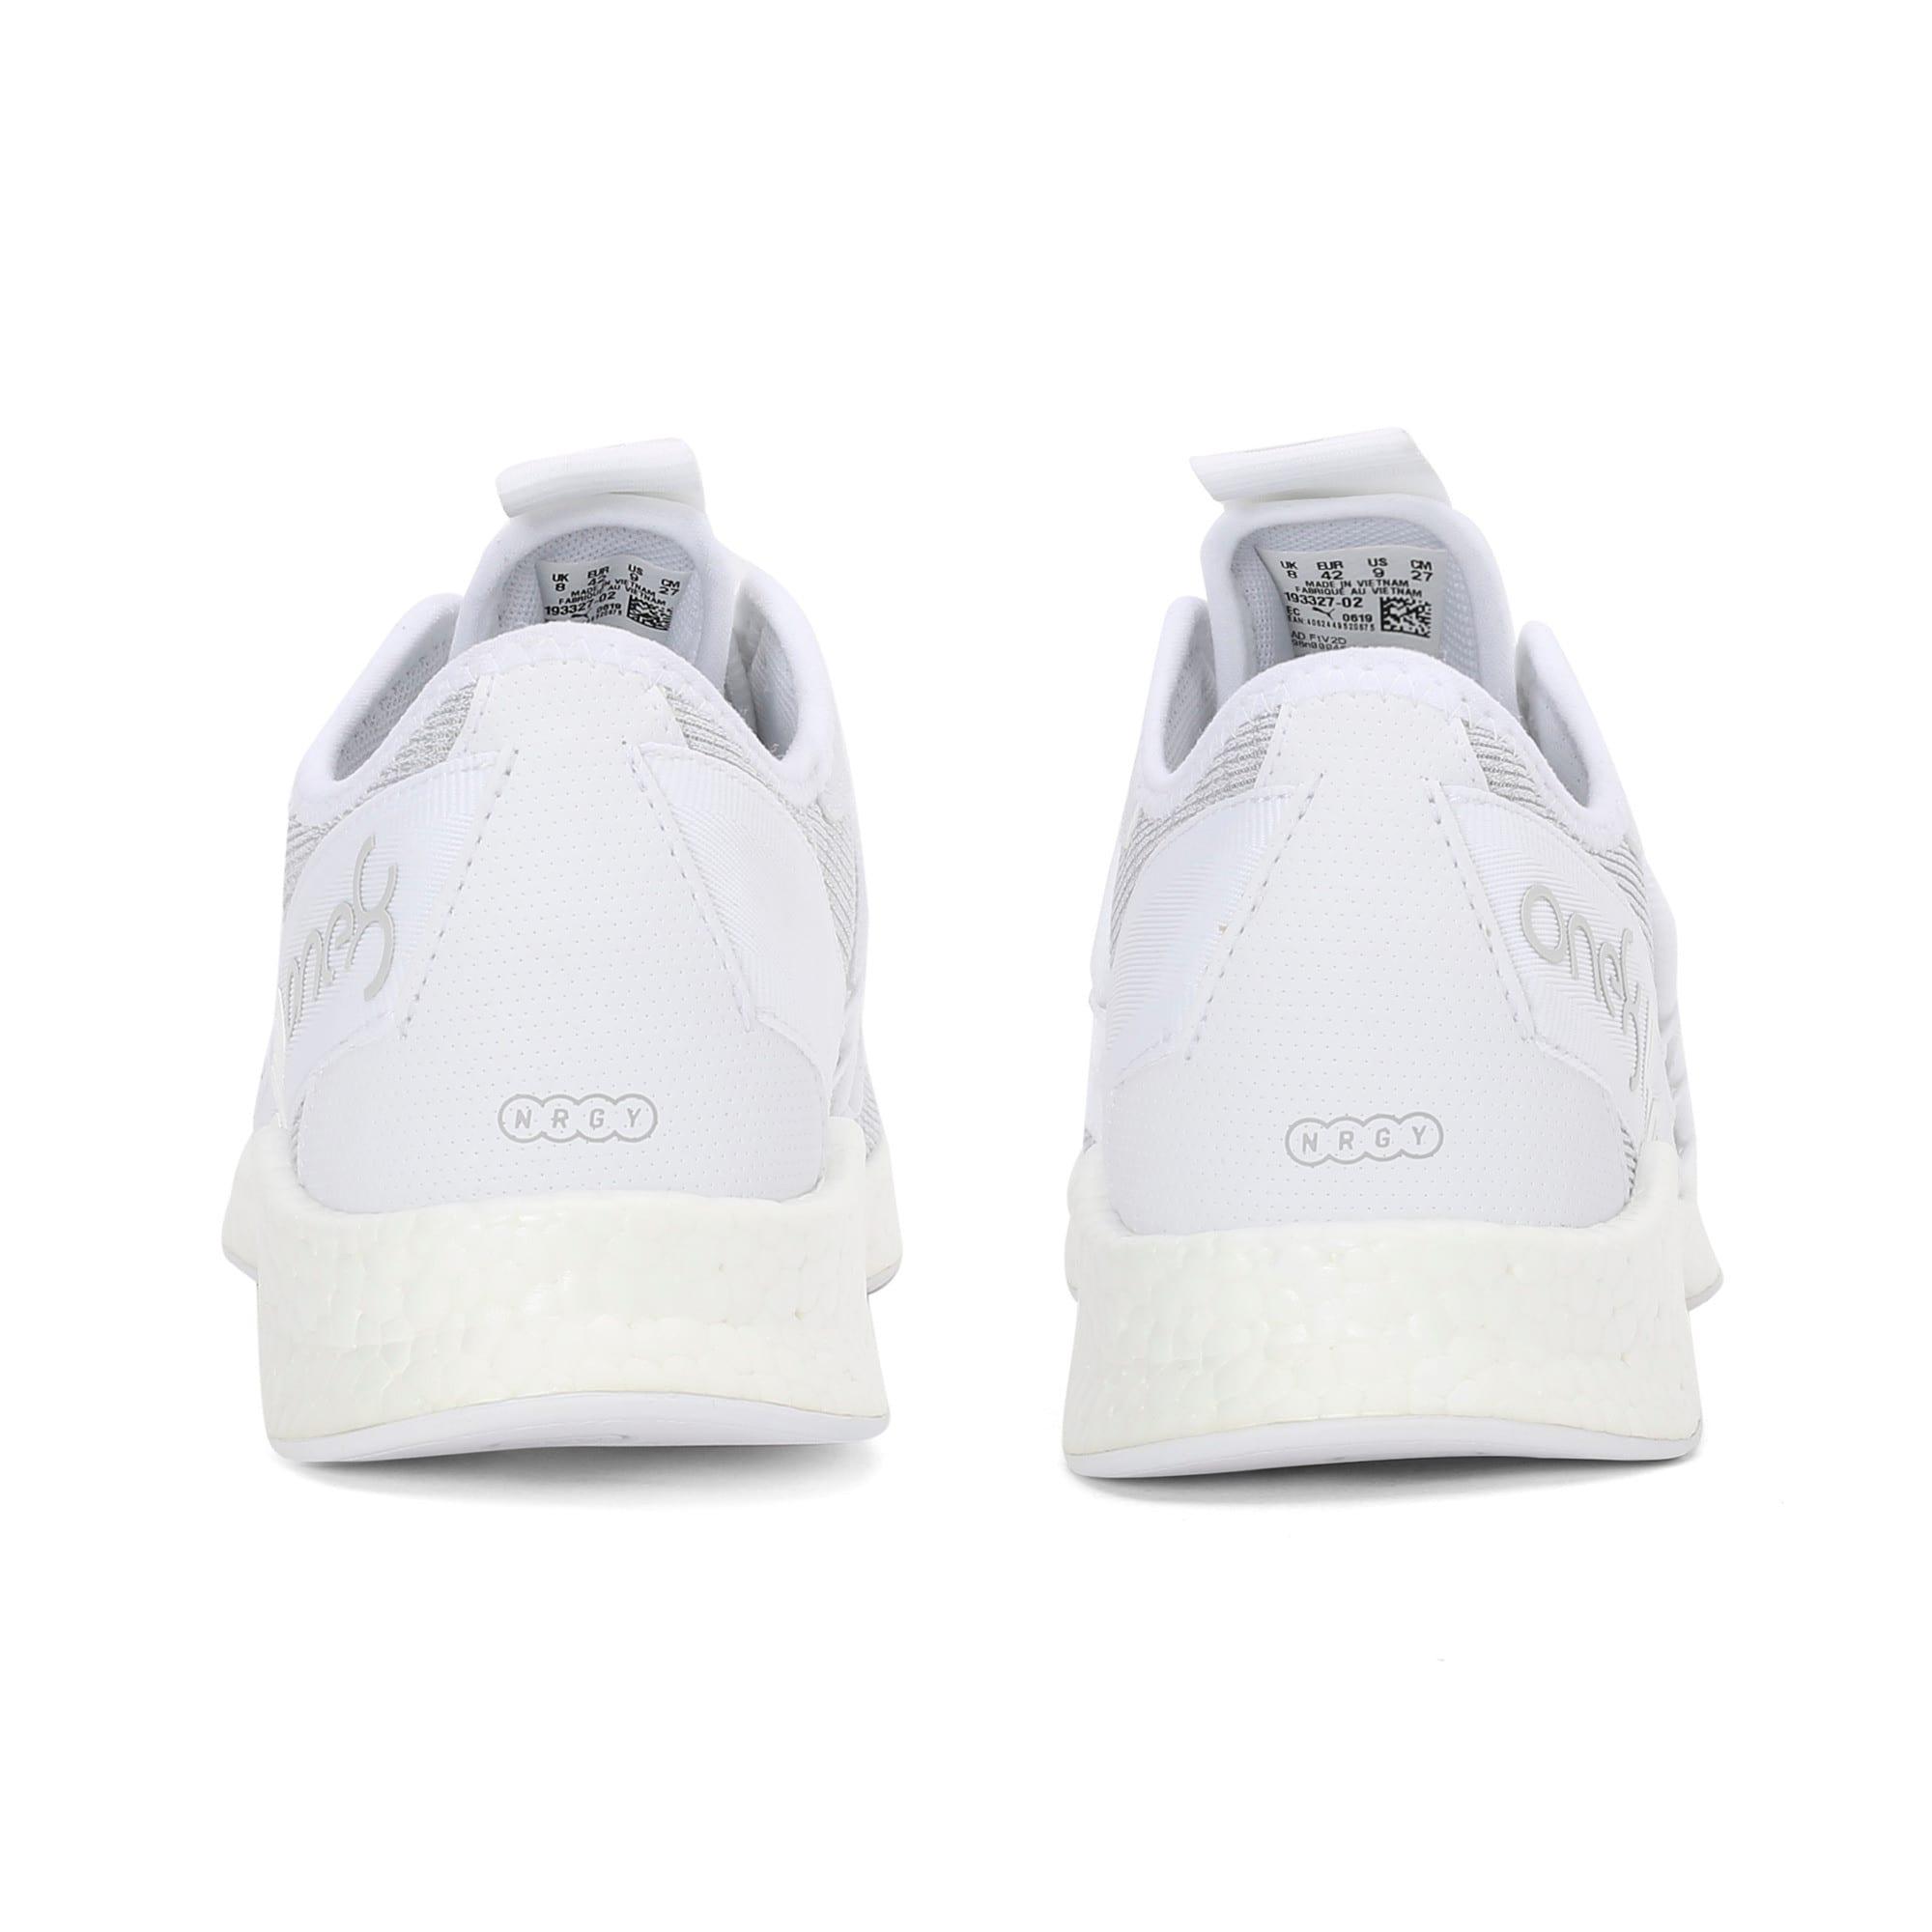 Thumbnail 3 of NRGY Star Knit one8 Unisex Running Shoes, Puma White-Glacier Gray, medium-IND